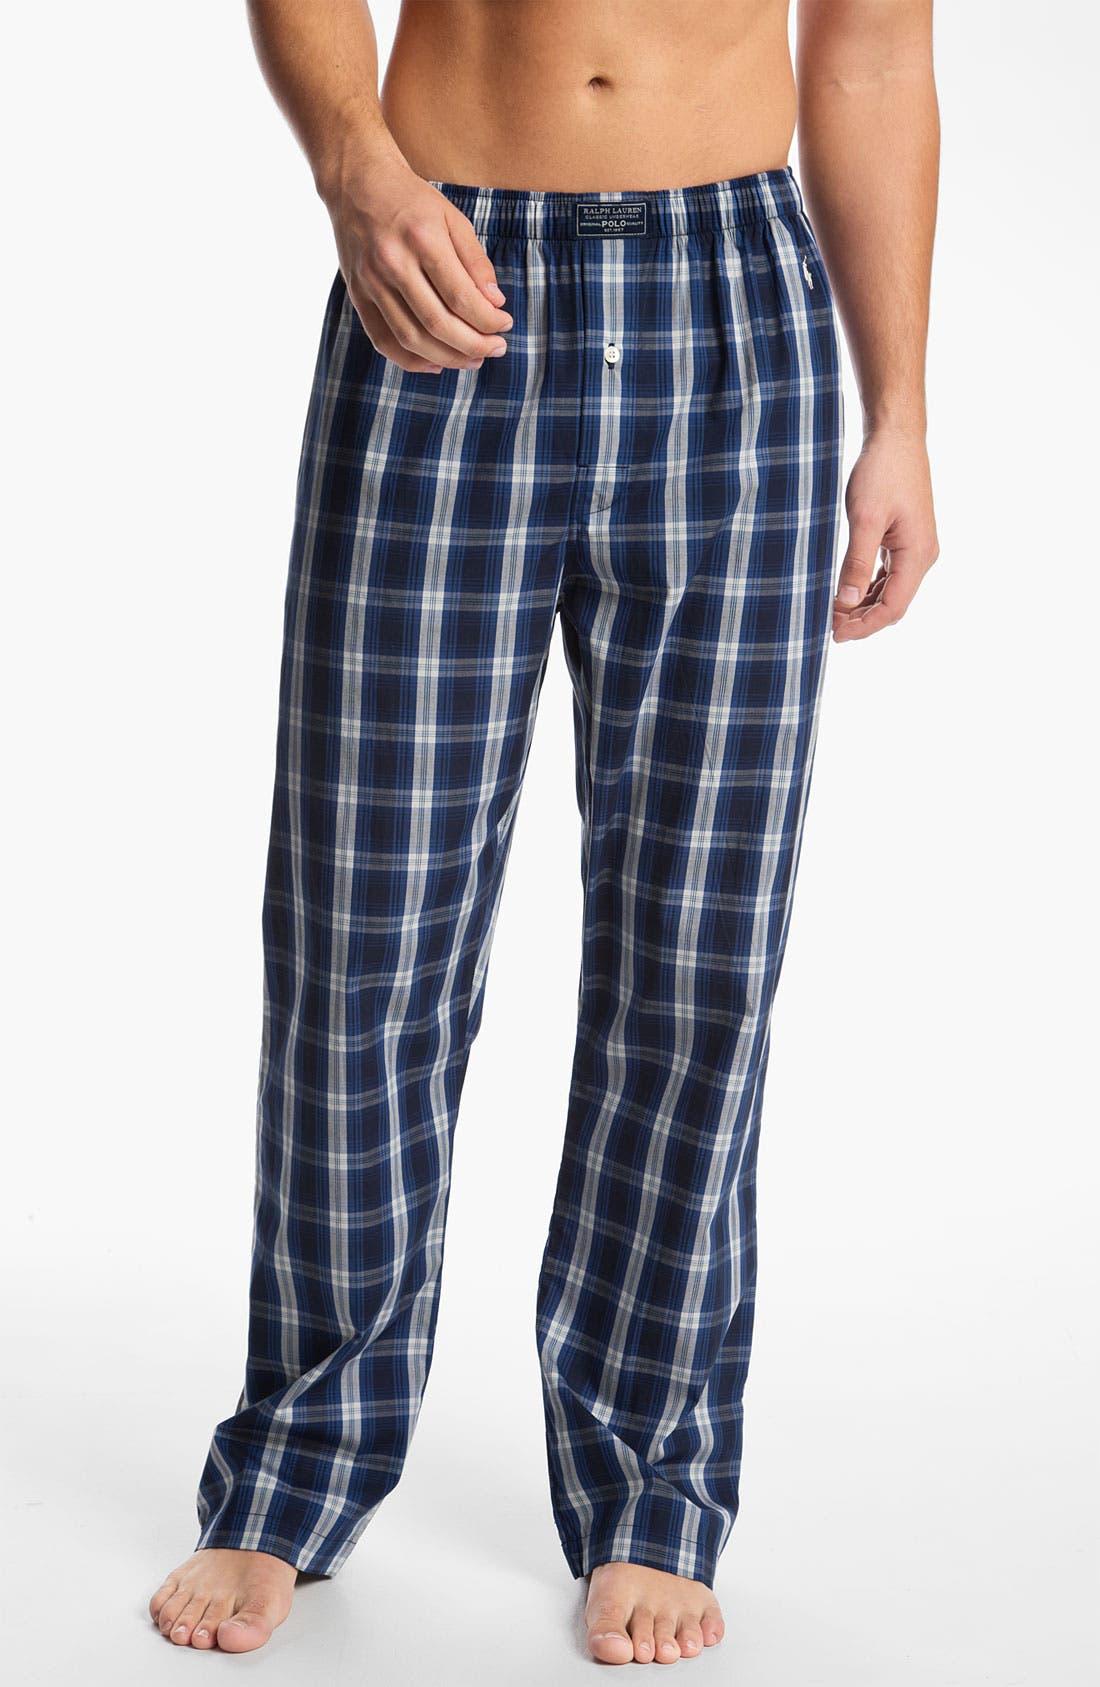 Alternate Image 1 Selected - Polo Ralph Lauren Lounge Pants